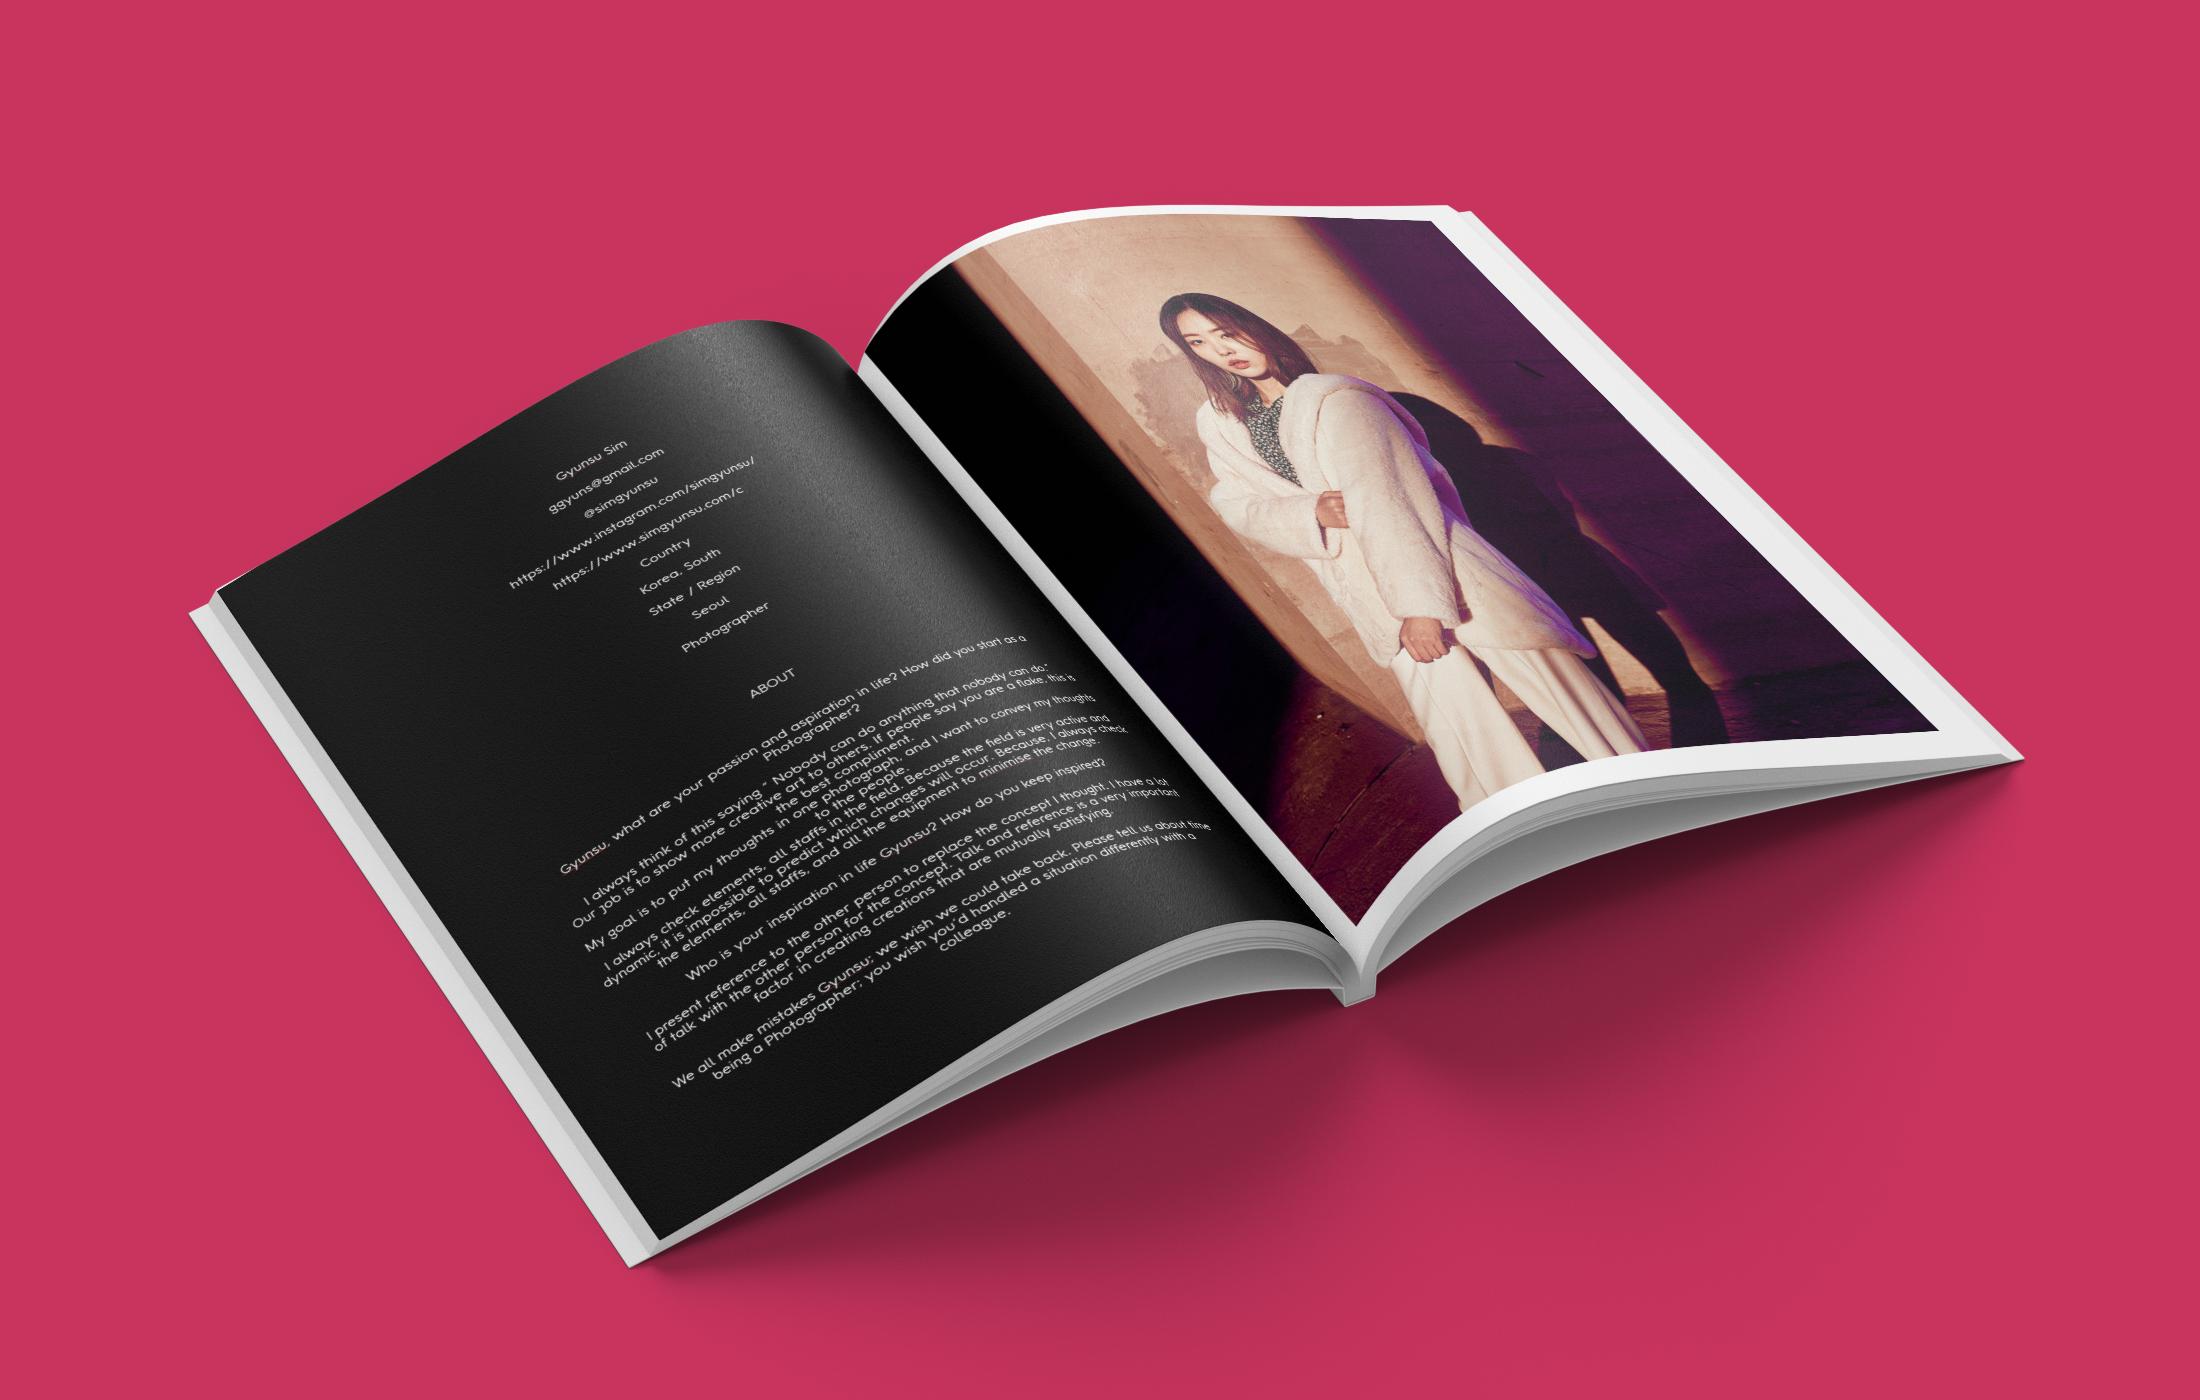 Model Citizen Magazine Issue 33, Macky Suson, Fashion Inclusion Now1.png